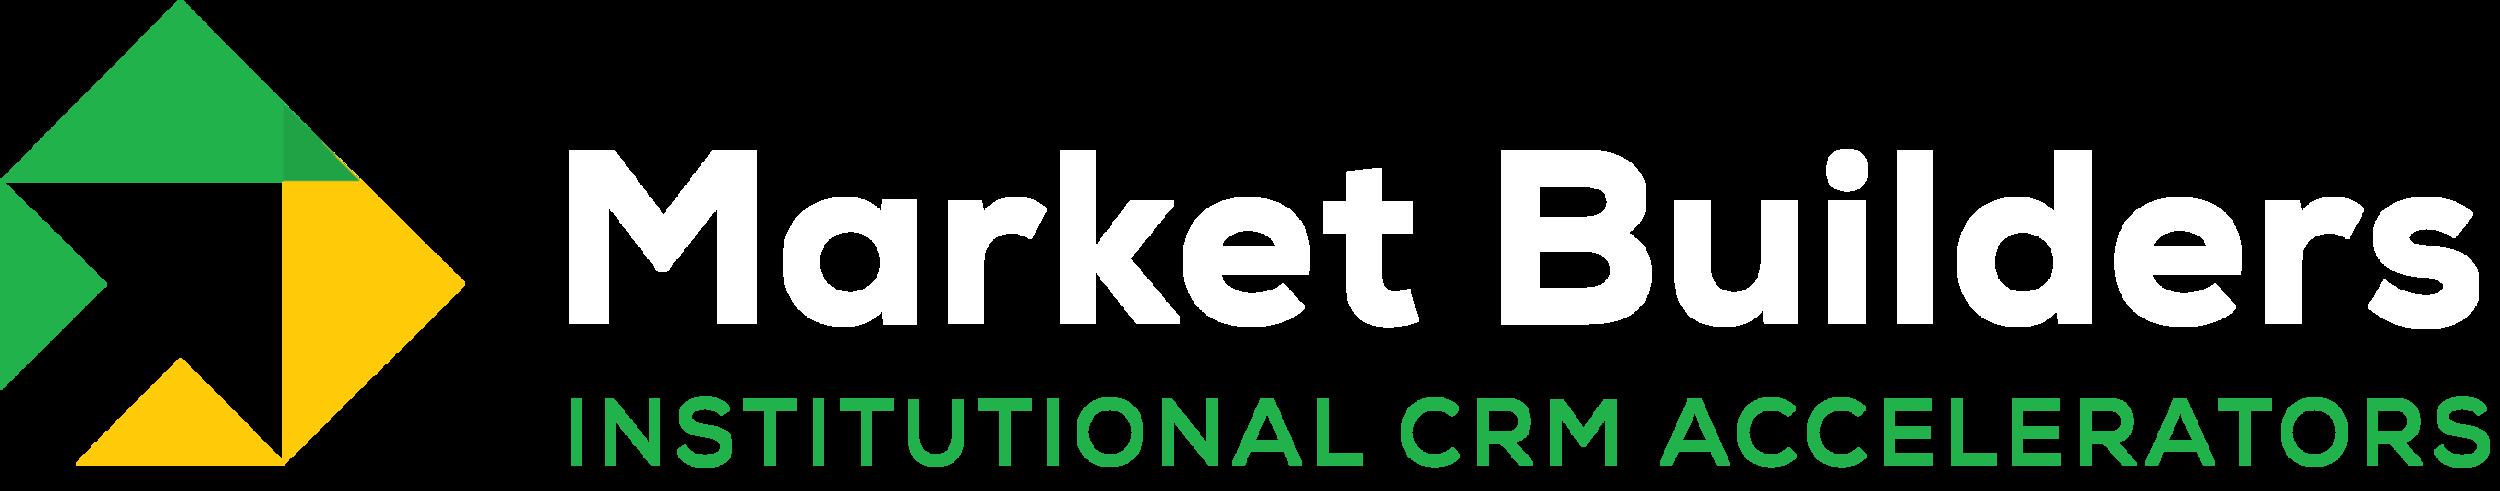 MarketBuilders-LogoHoriz-KO.png